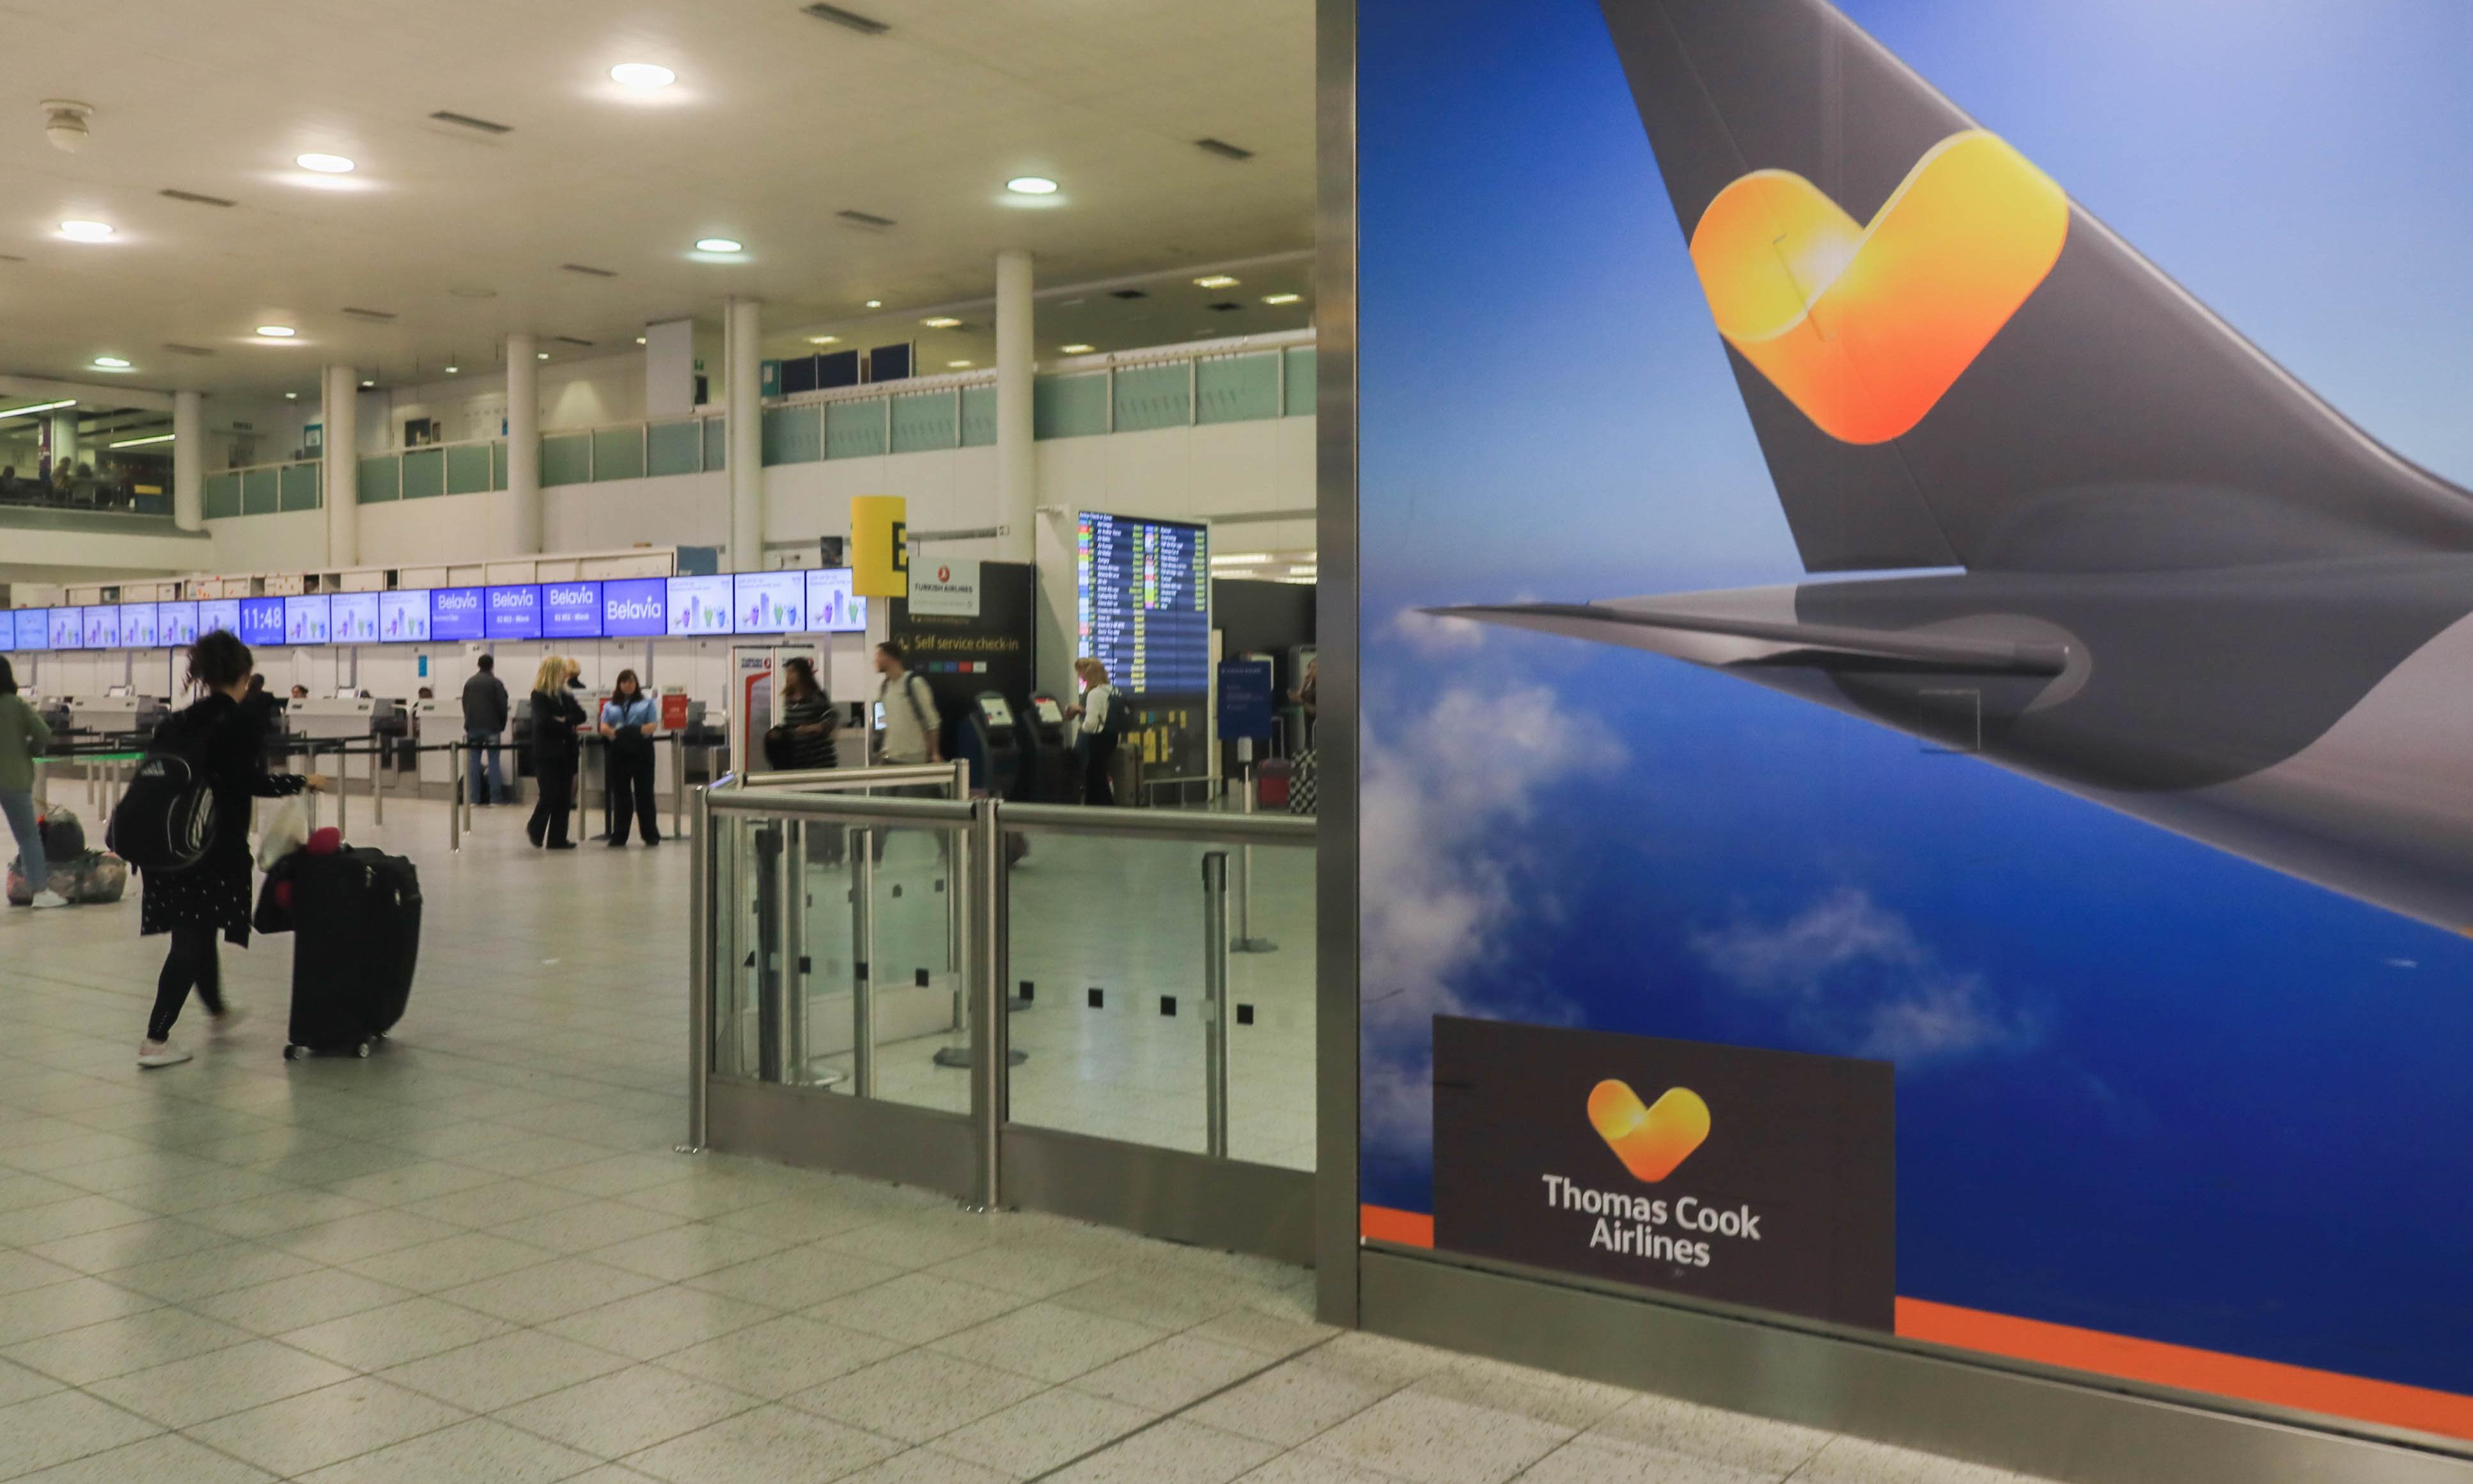 Thomas Cook travellers still boarding as clock ticks down on talks